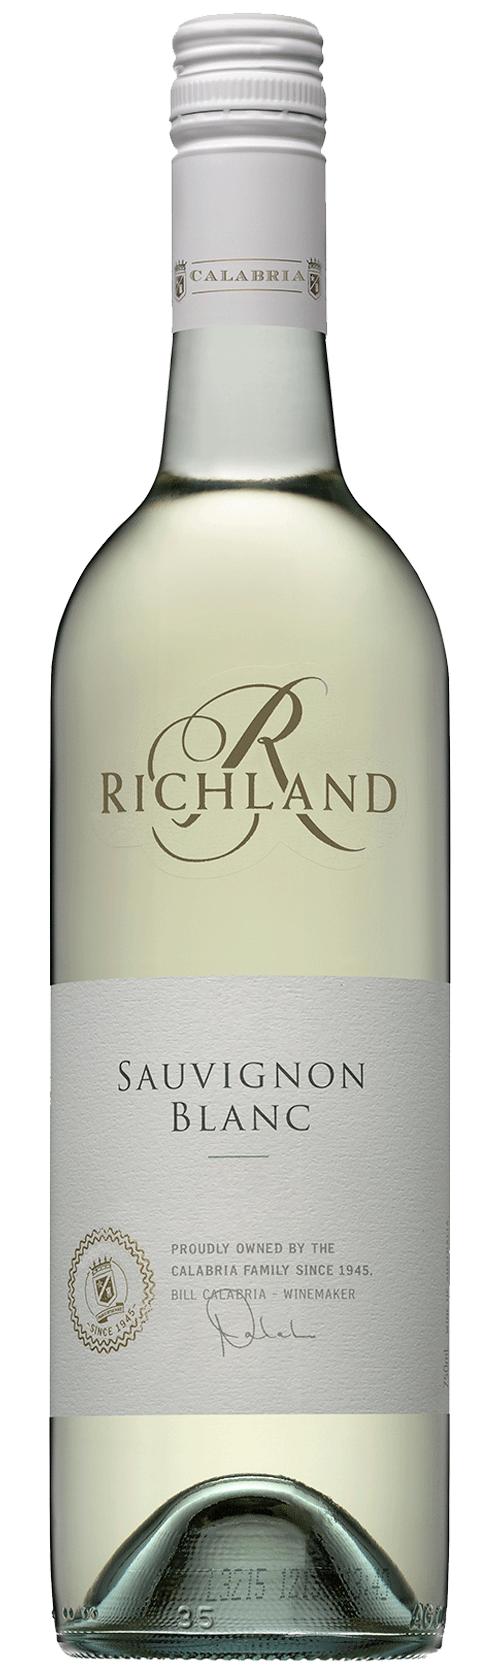 Richland Sauvignon Blanc 2018